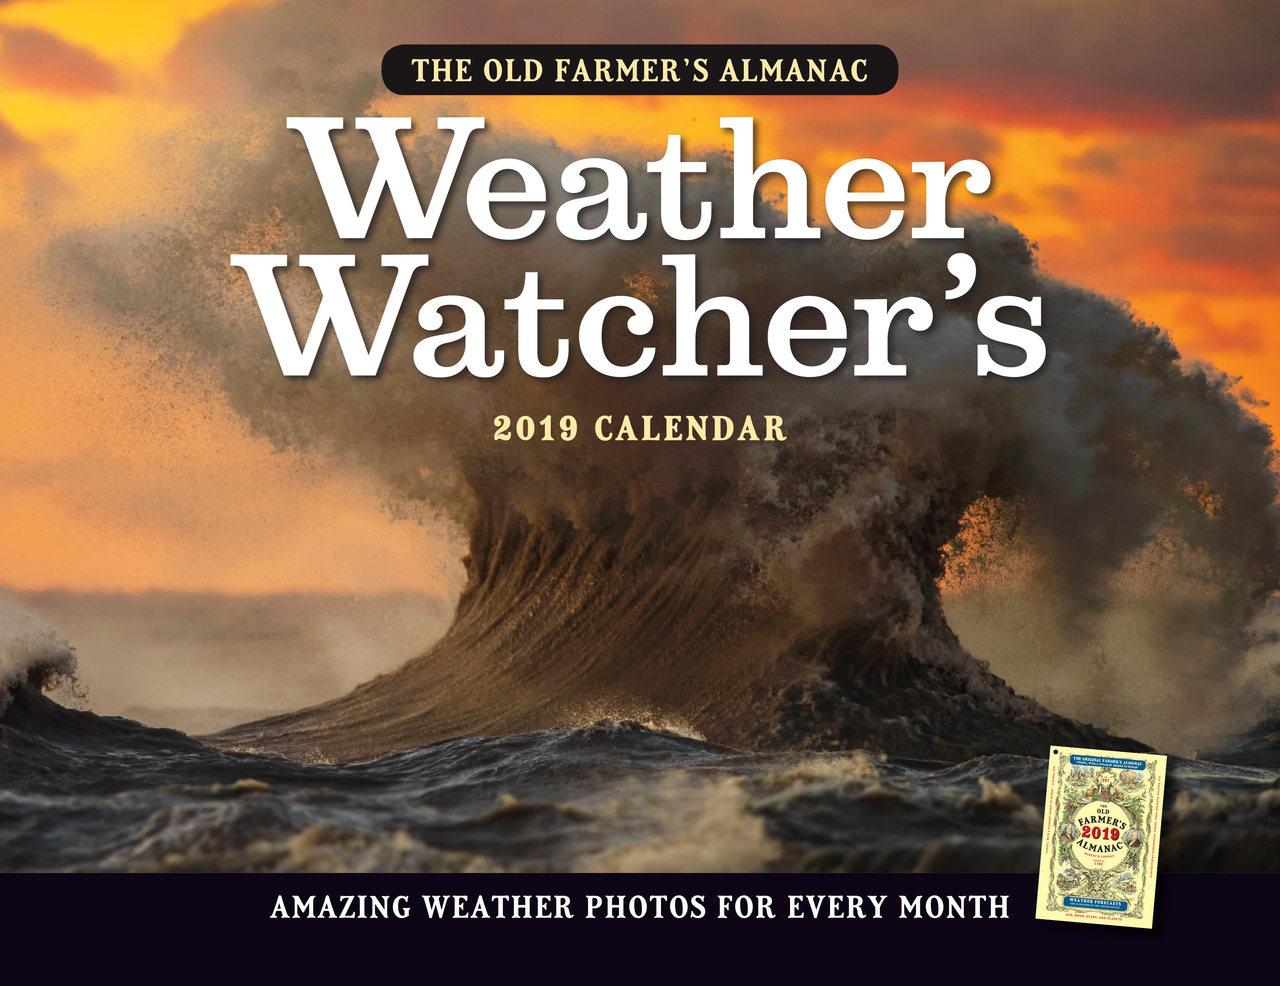 The 2019 Old Farmer\'s Almanac Weather Watcher\'s Calendar - The Old ...